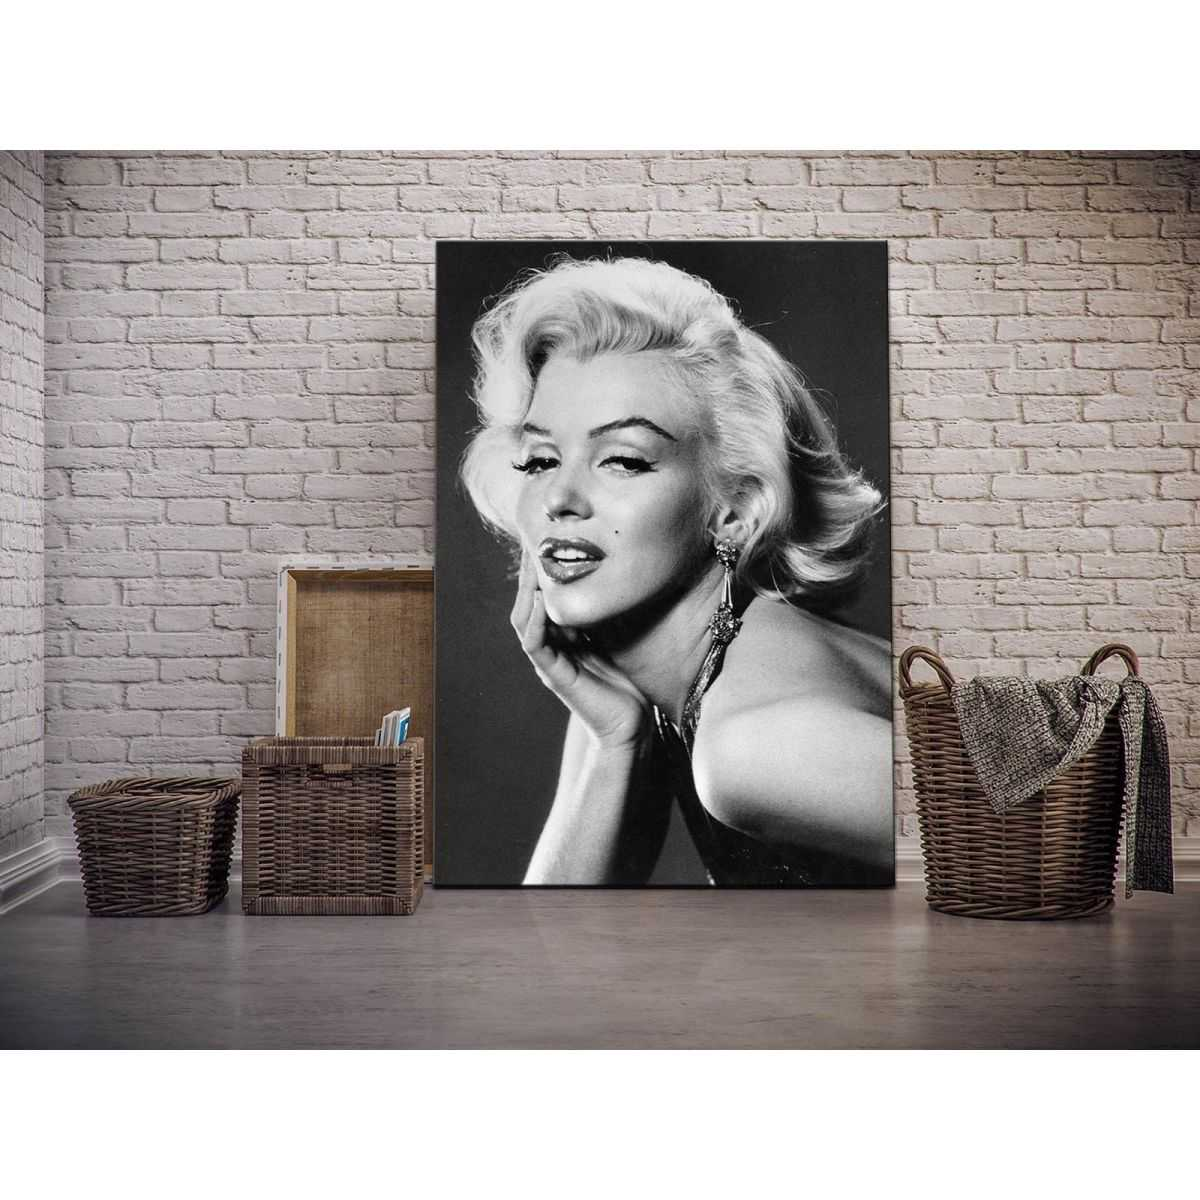 Quadro Marilyn Monroe posa sensuale bianco e nero moderno stampa su tela mrv345